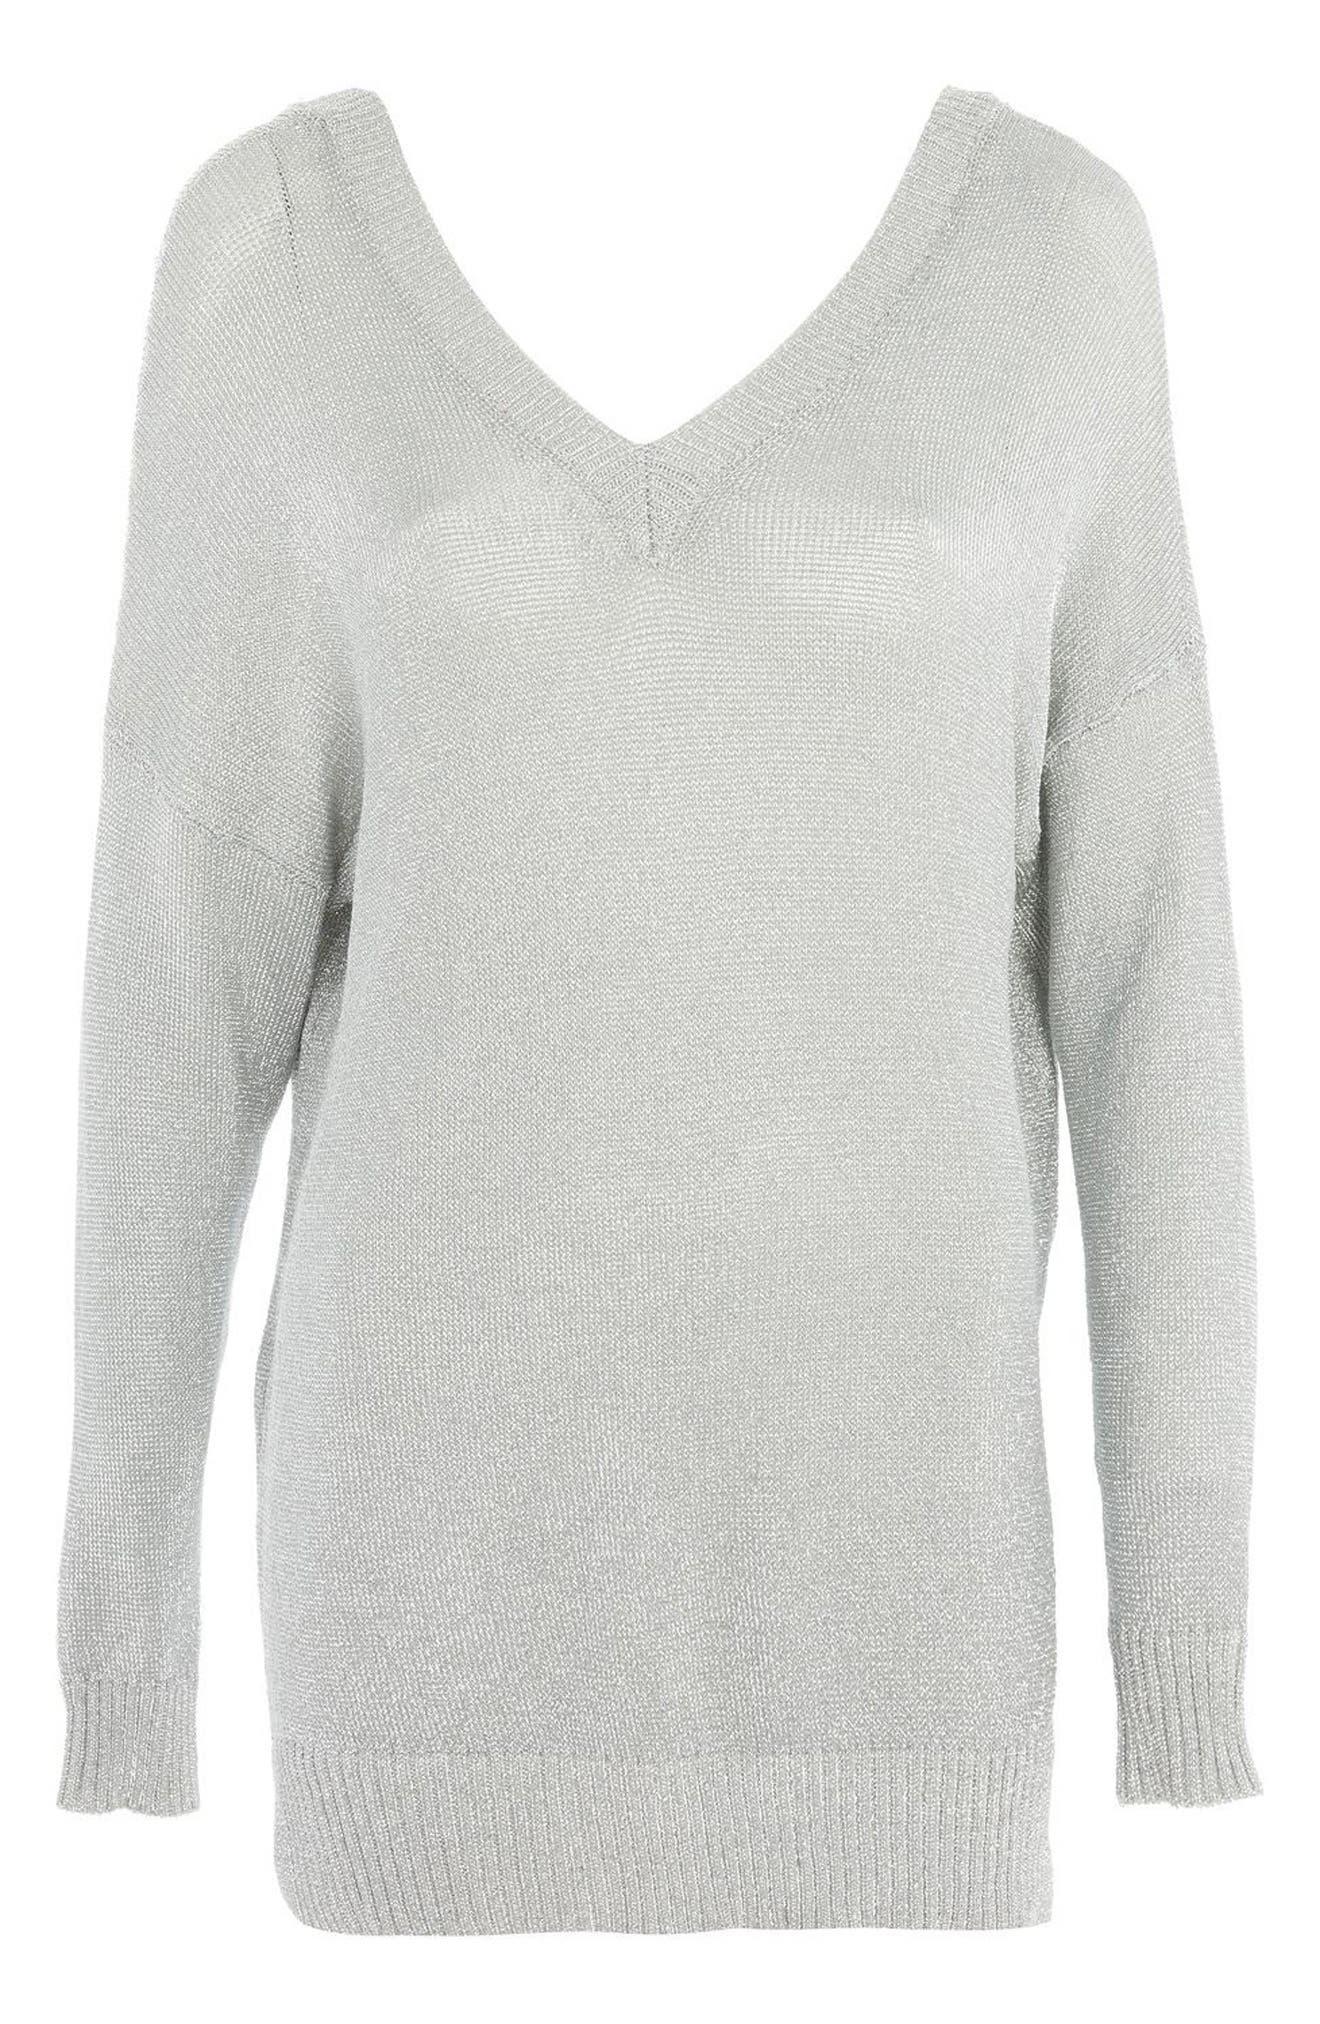 Metallic Longline V-Neck Sweater,                             Alternate thumbnail 4, color,                             040